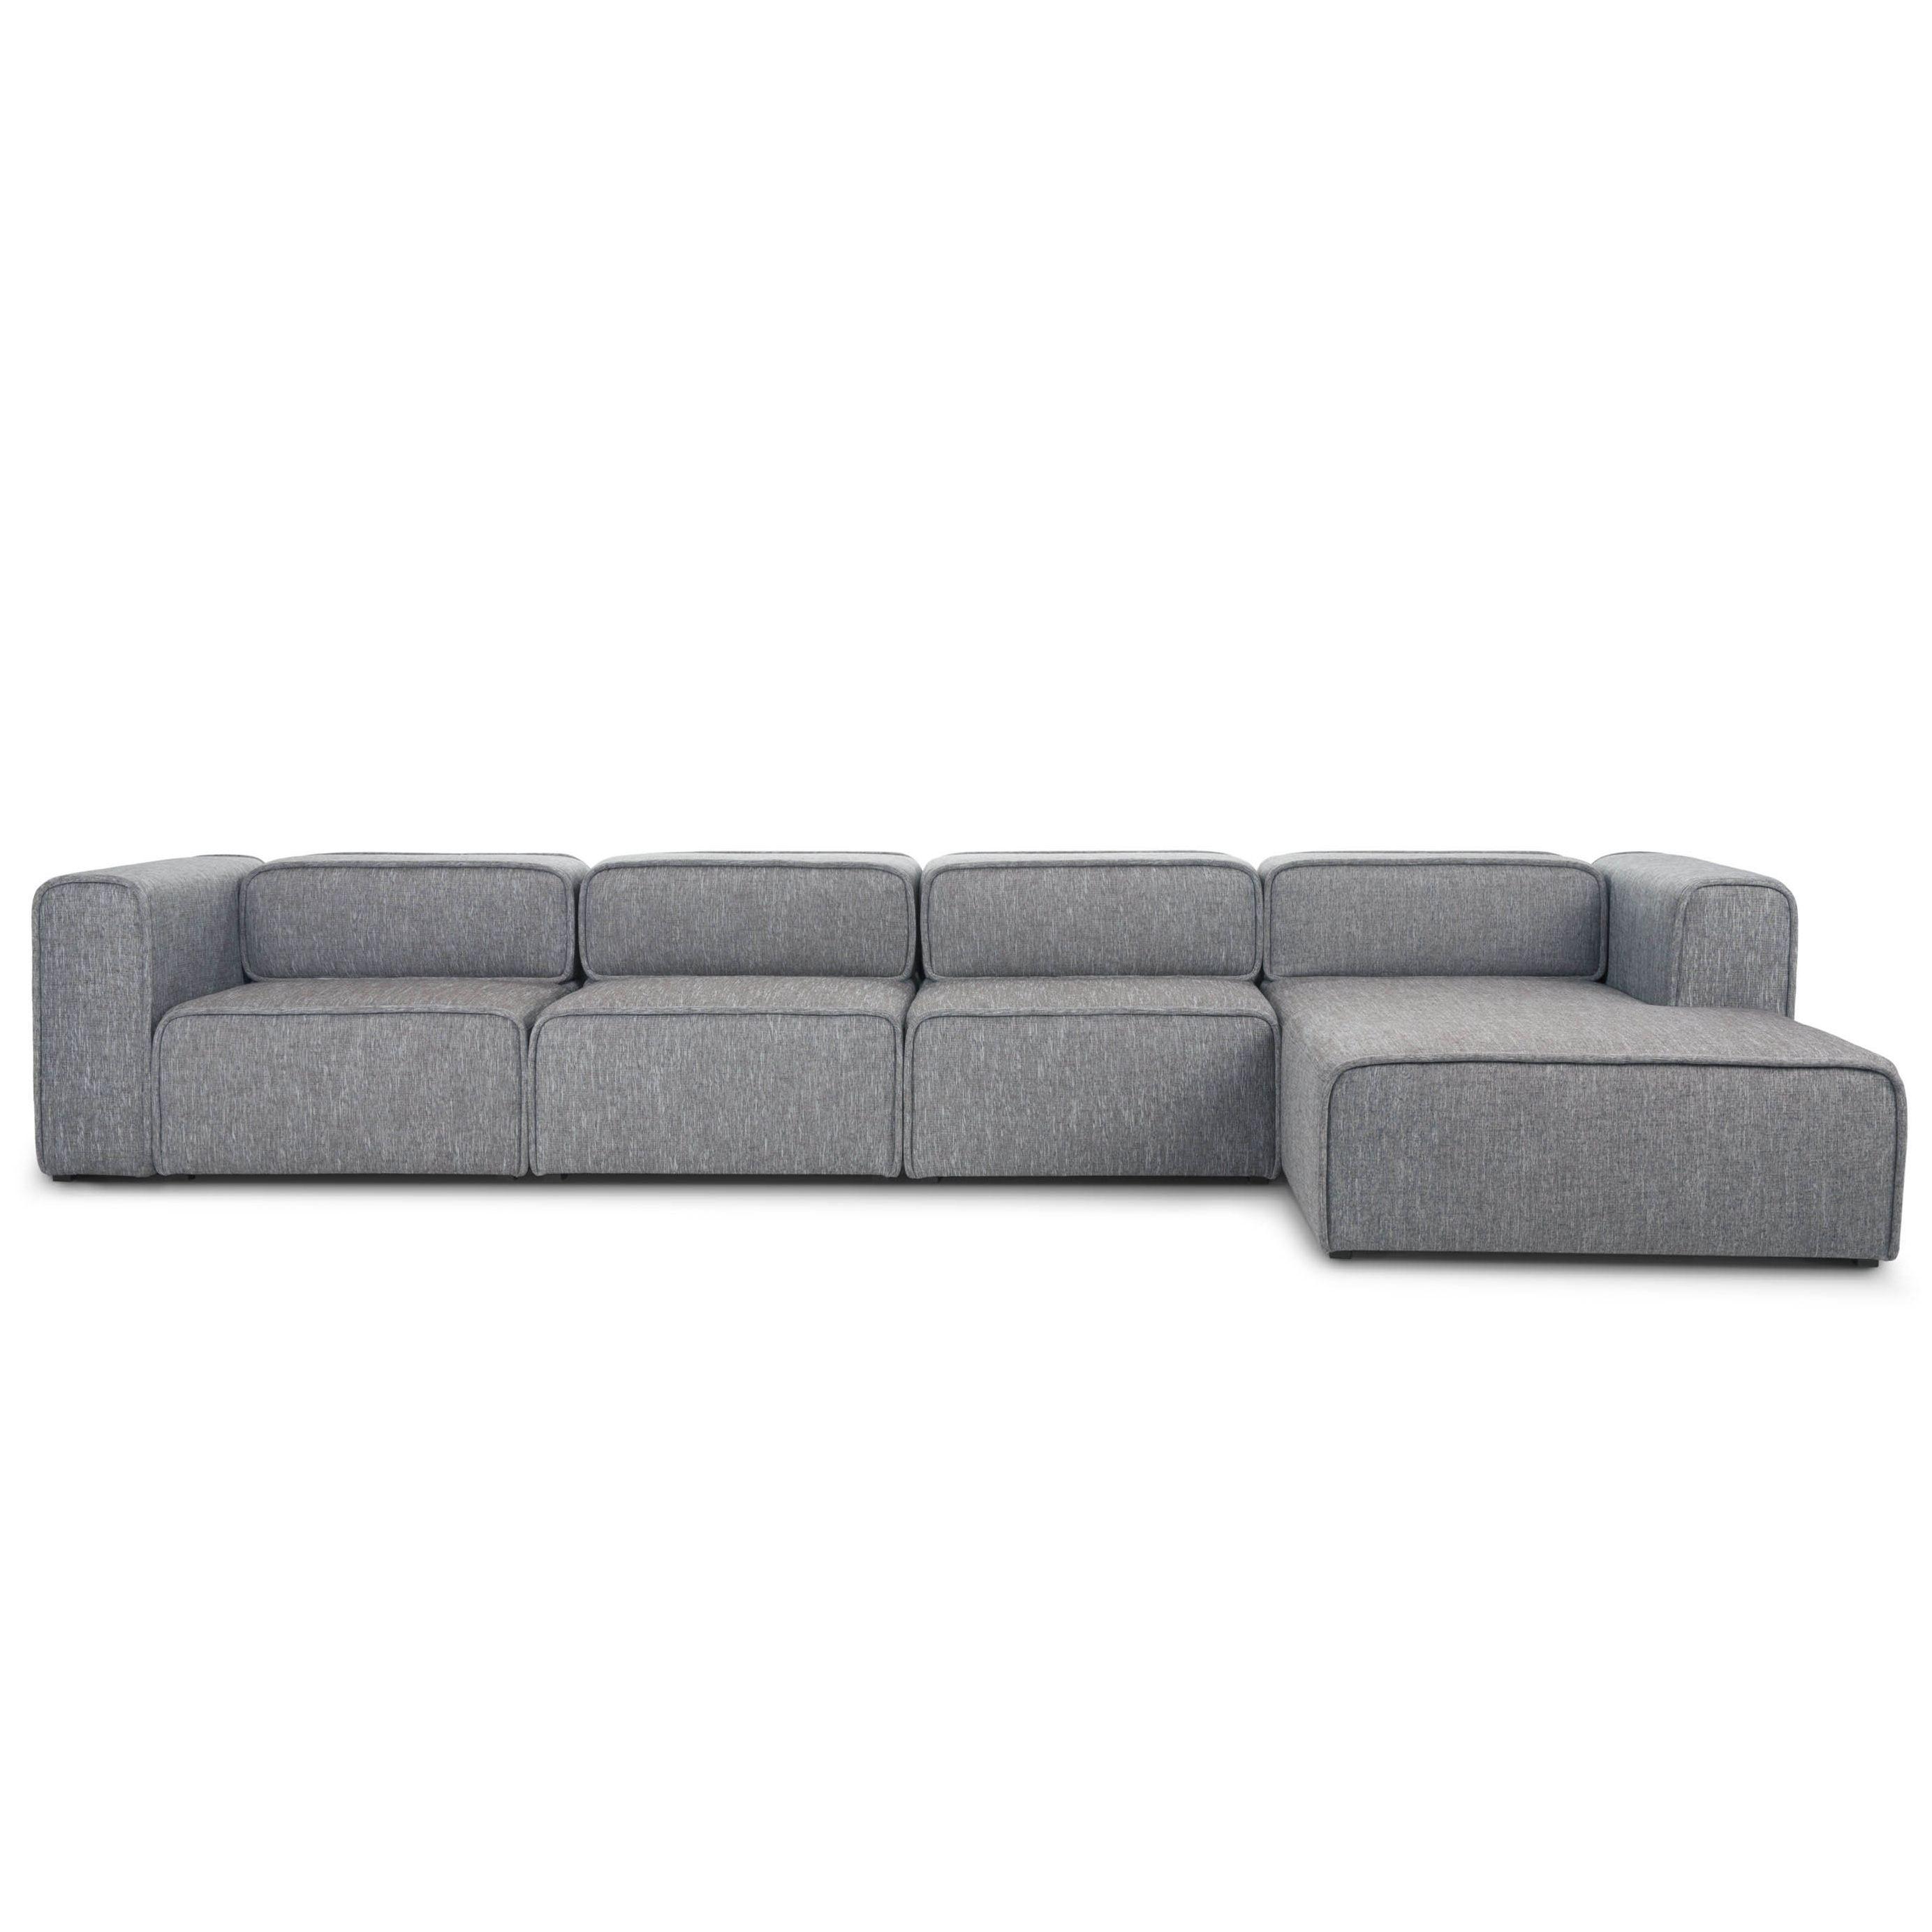 The Perfect Couch Meuble Idee Salon Idees Pour La Maison